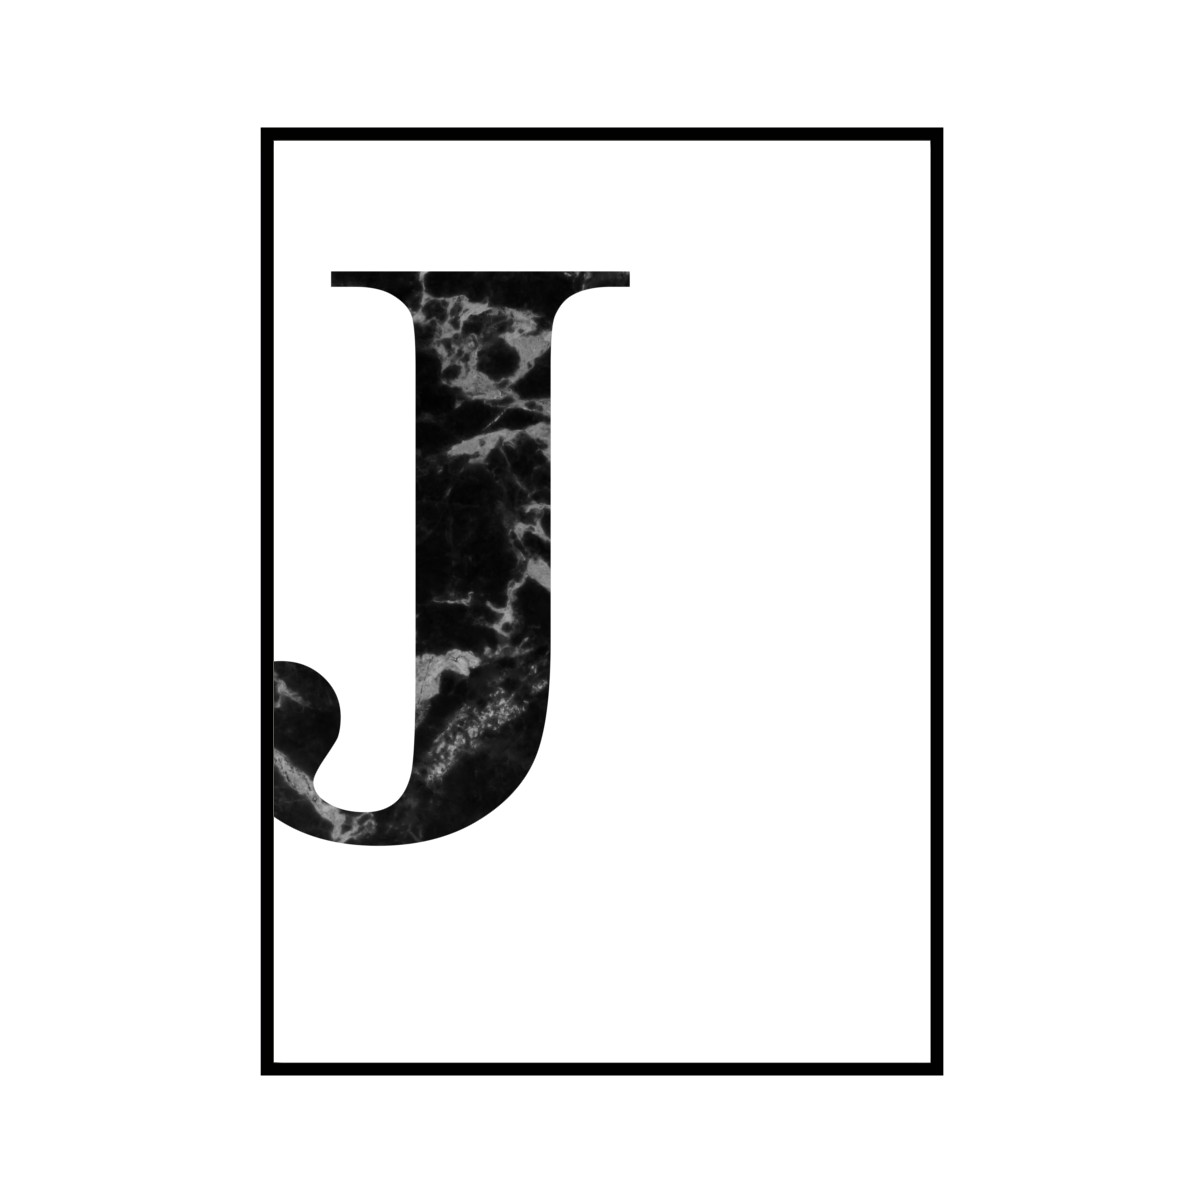 """J"" 黒大理石 - Black marble - ALPHAシリーズ [SD-000511] B4サイズ ポスター単品"